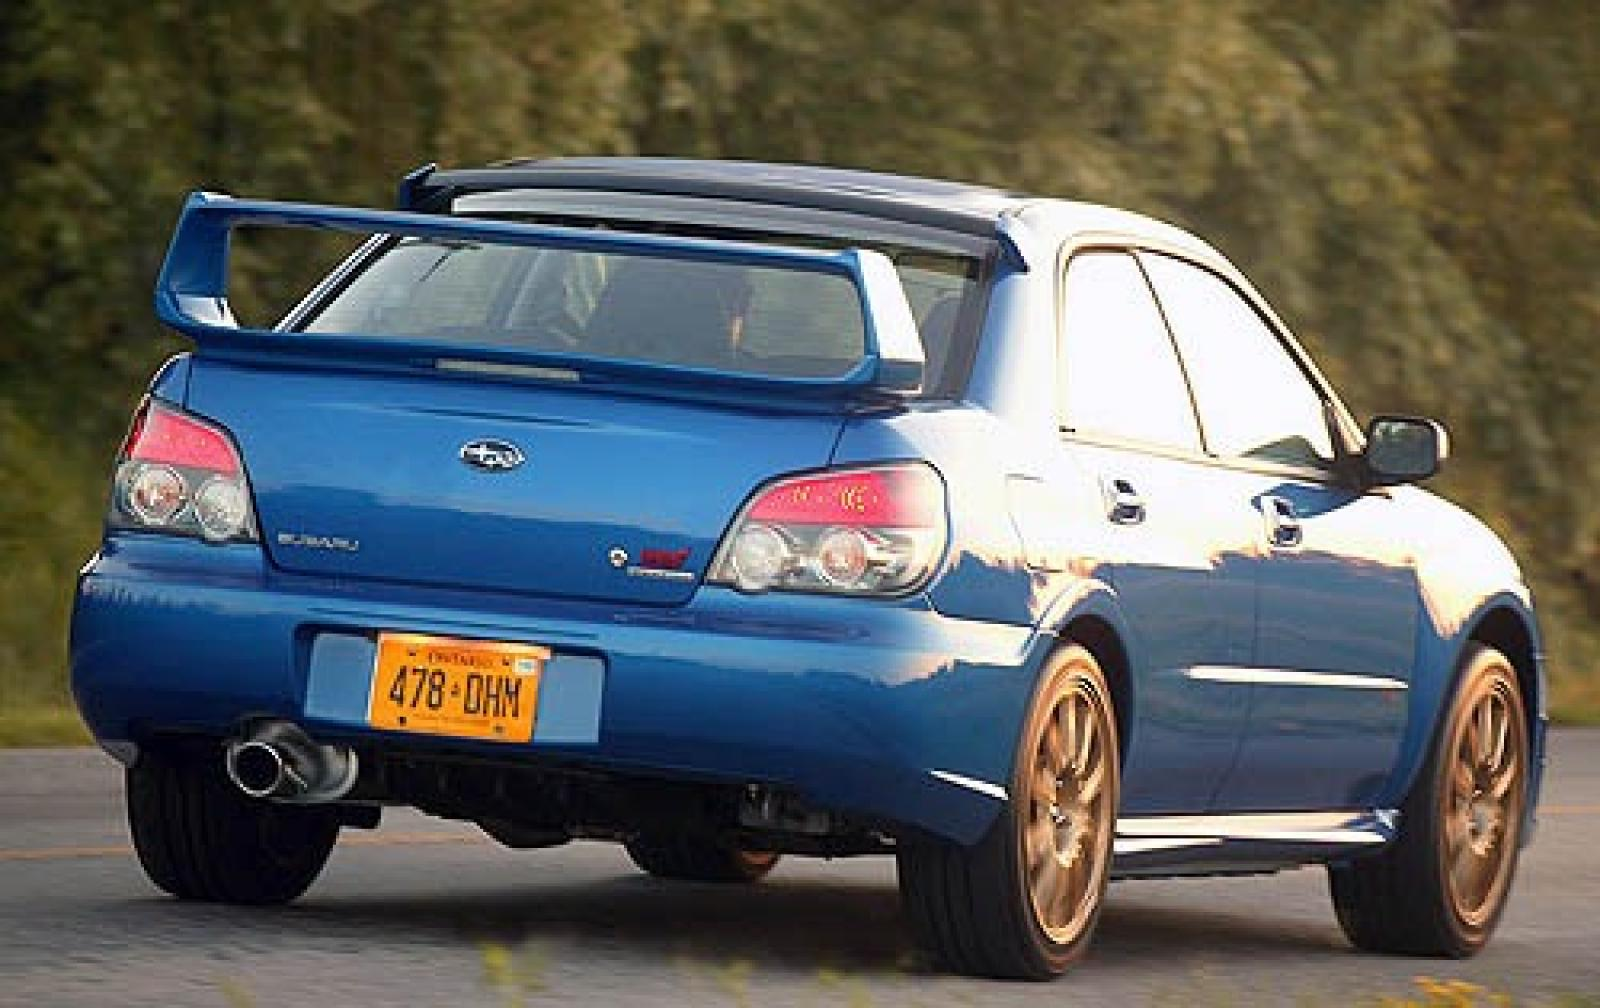 ... 2006 Subaru Impreza WRX L exterior #9 800 1024 1280 1600 origin ...